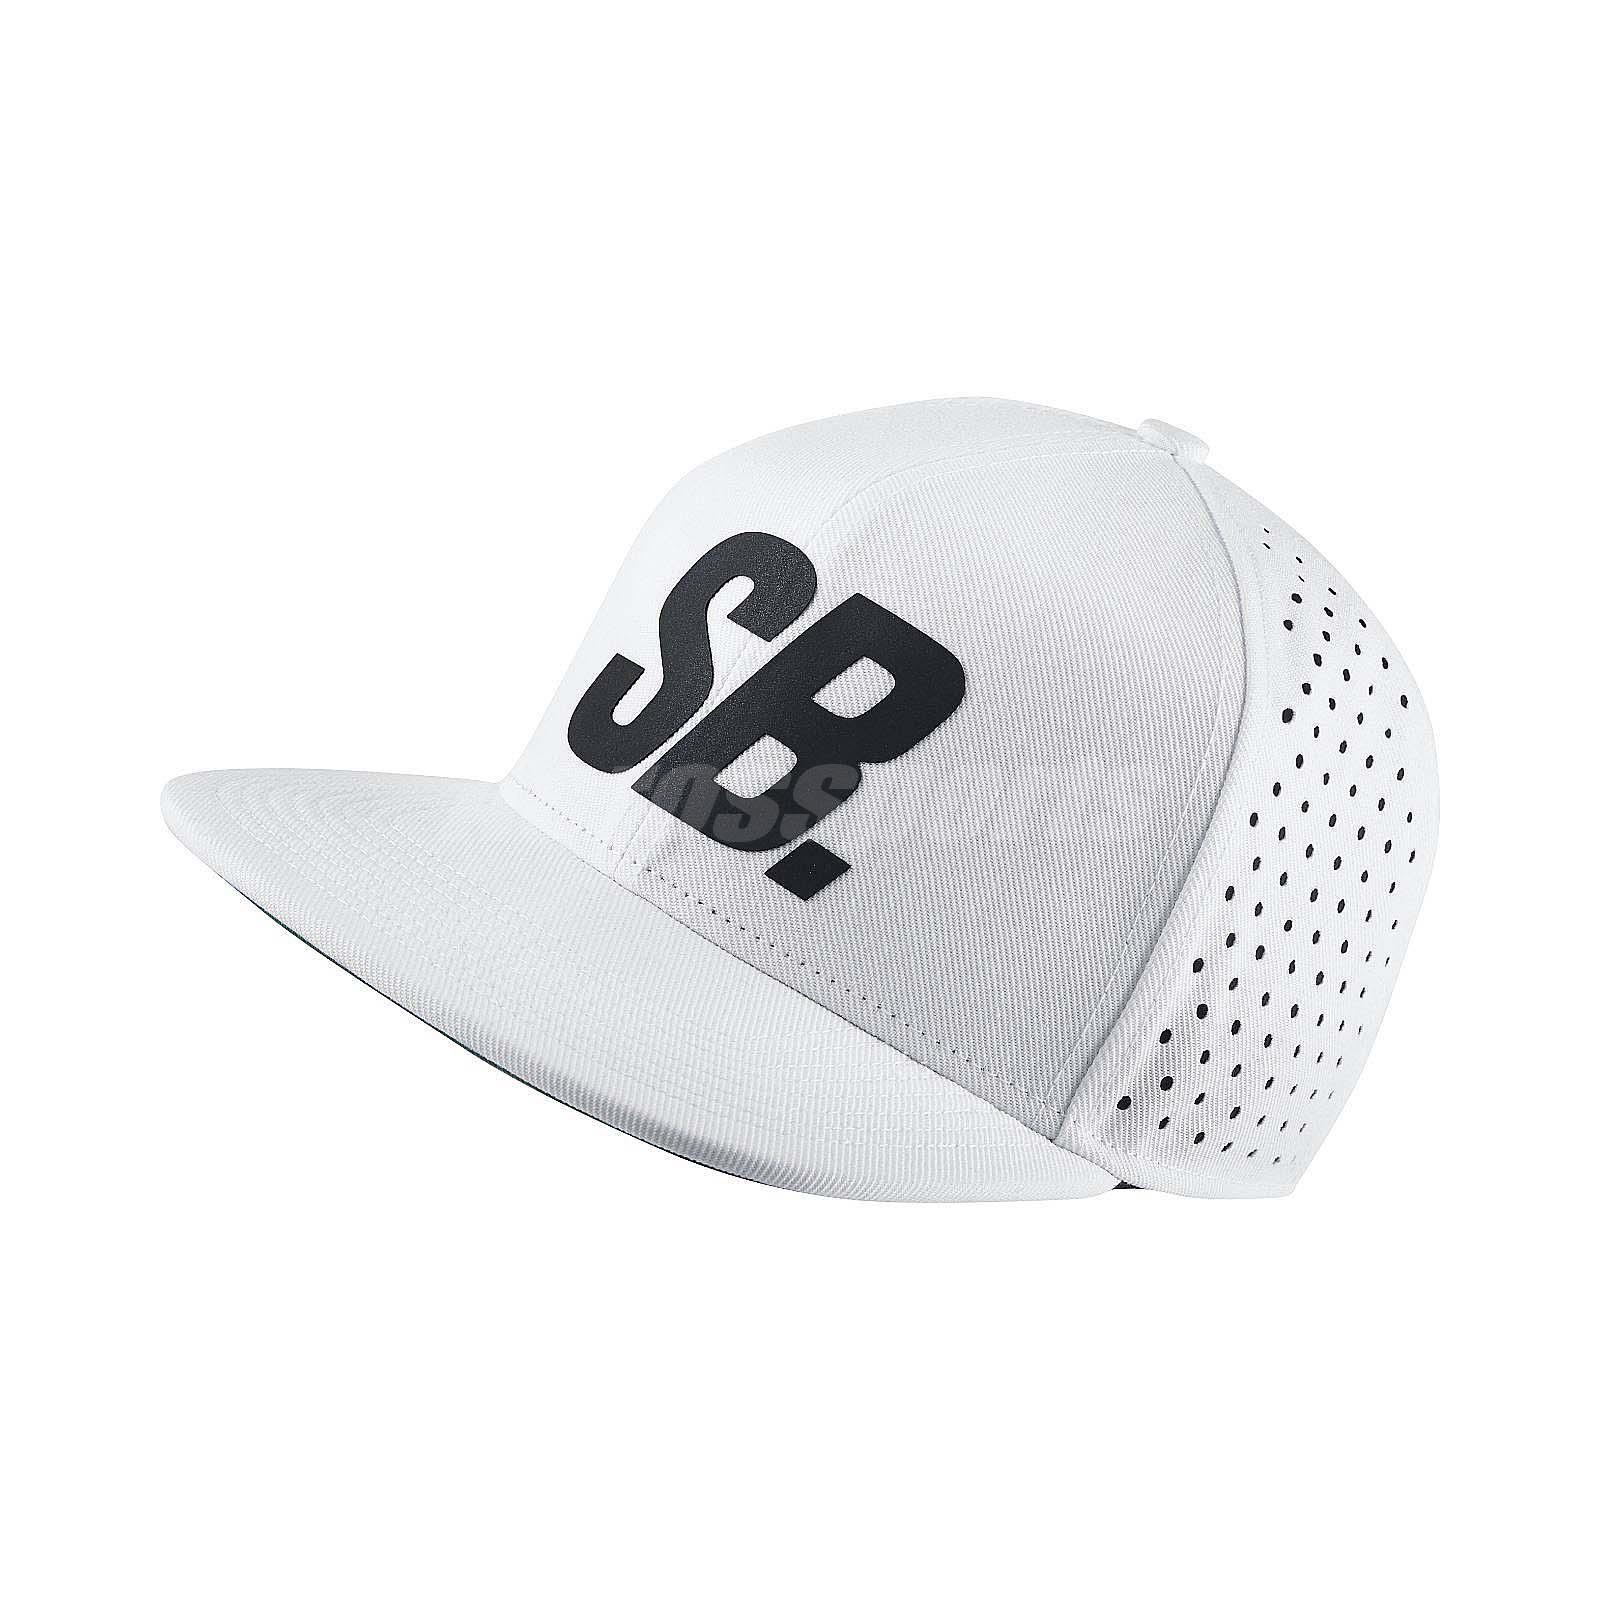 Details about Nike SB Black Reflective Pro Trucker White Black Cap  Adjustable Hat 804567-100 f8ae0faddd0